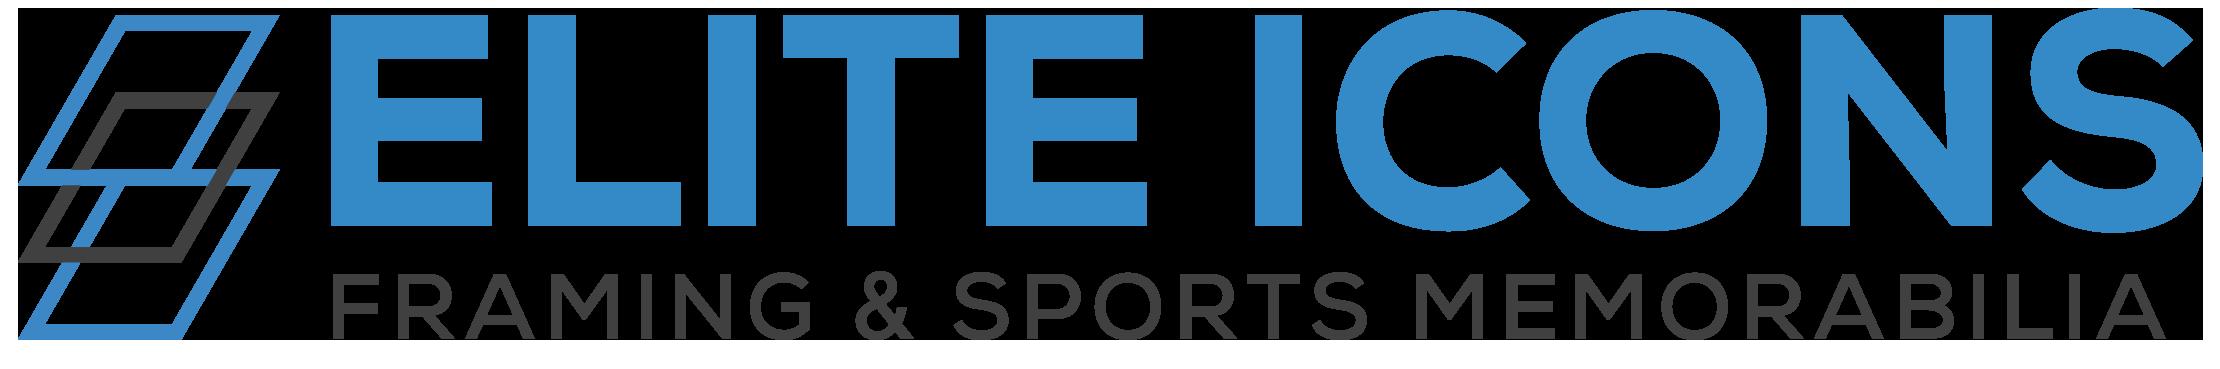 logo-color-2